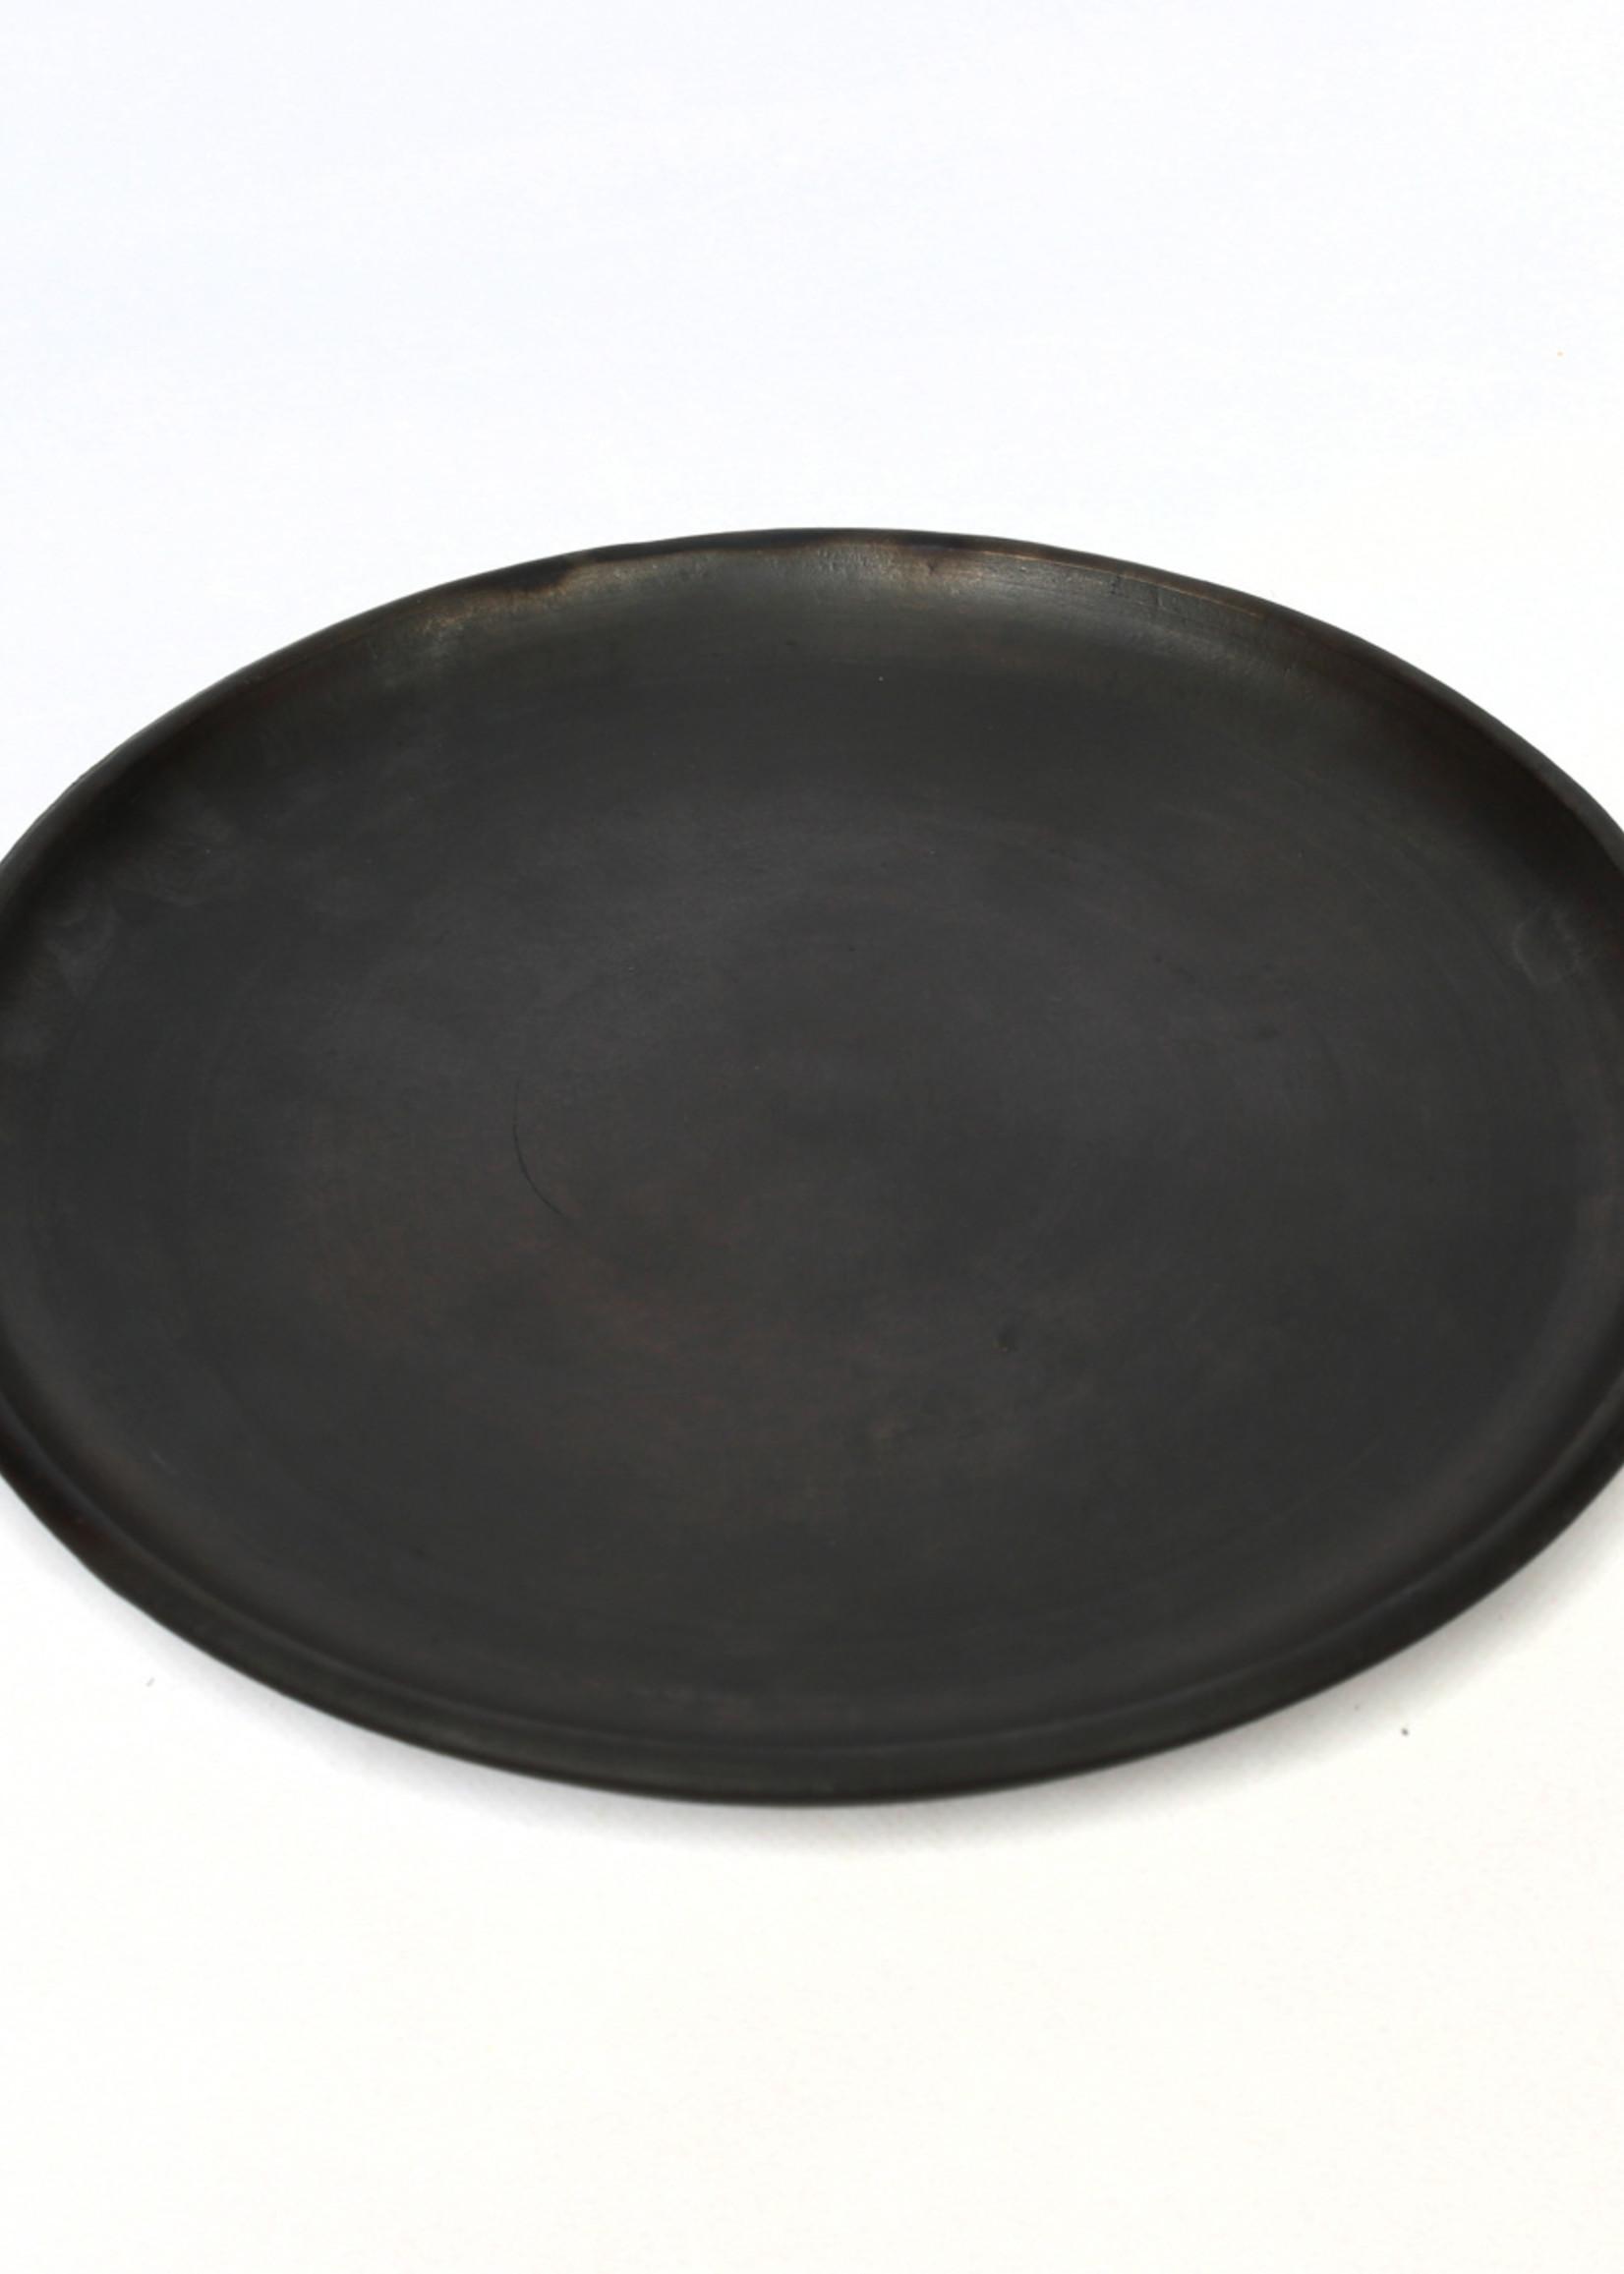 The Burned Classic Plate - Black - L